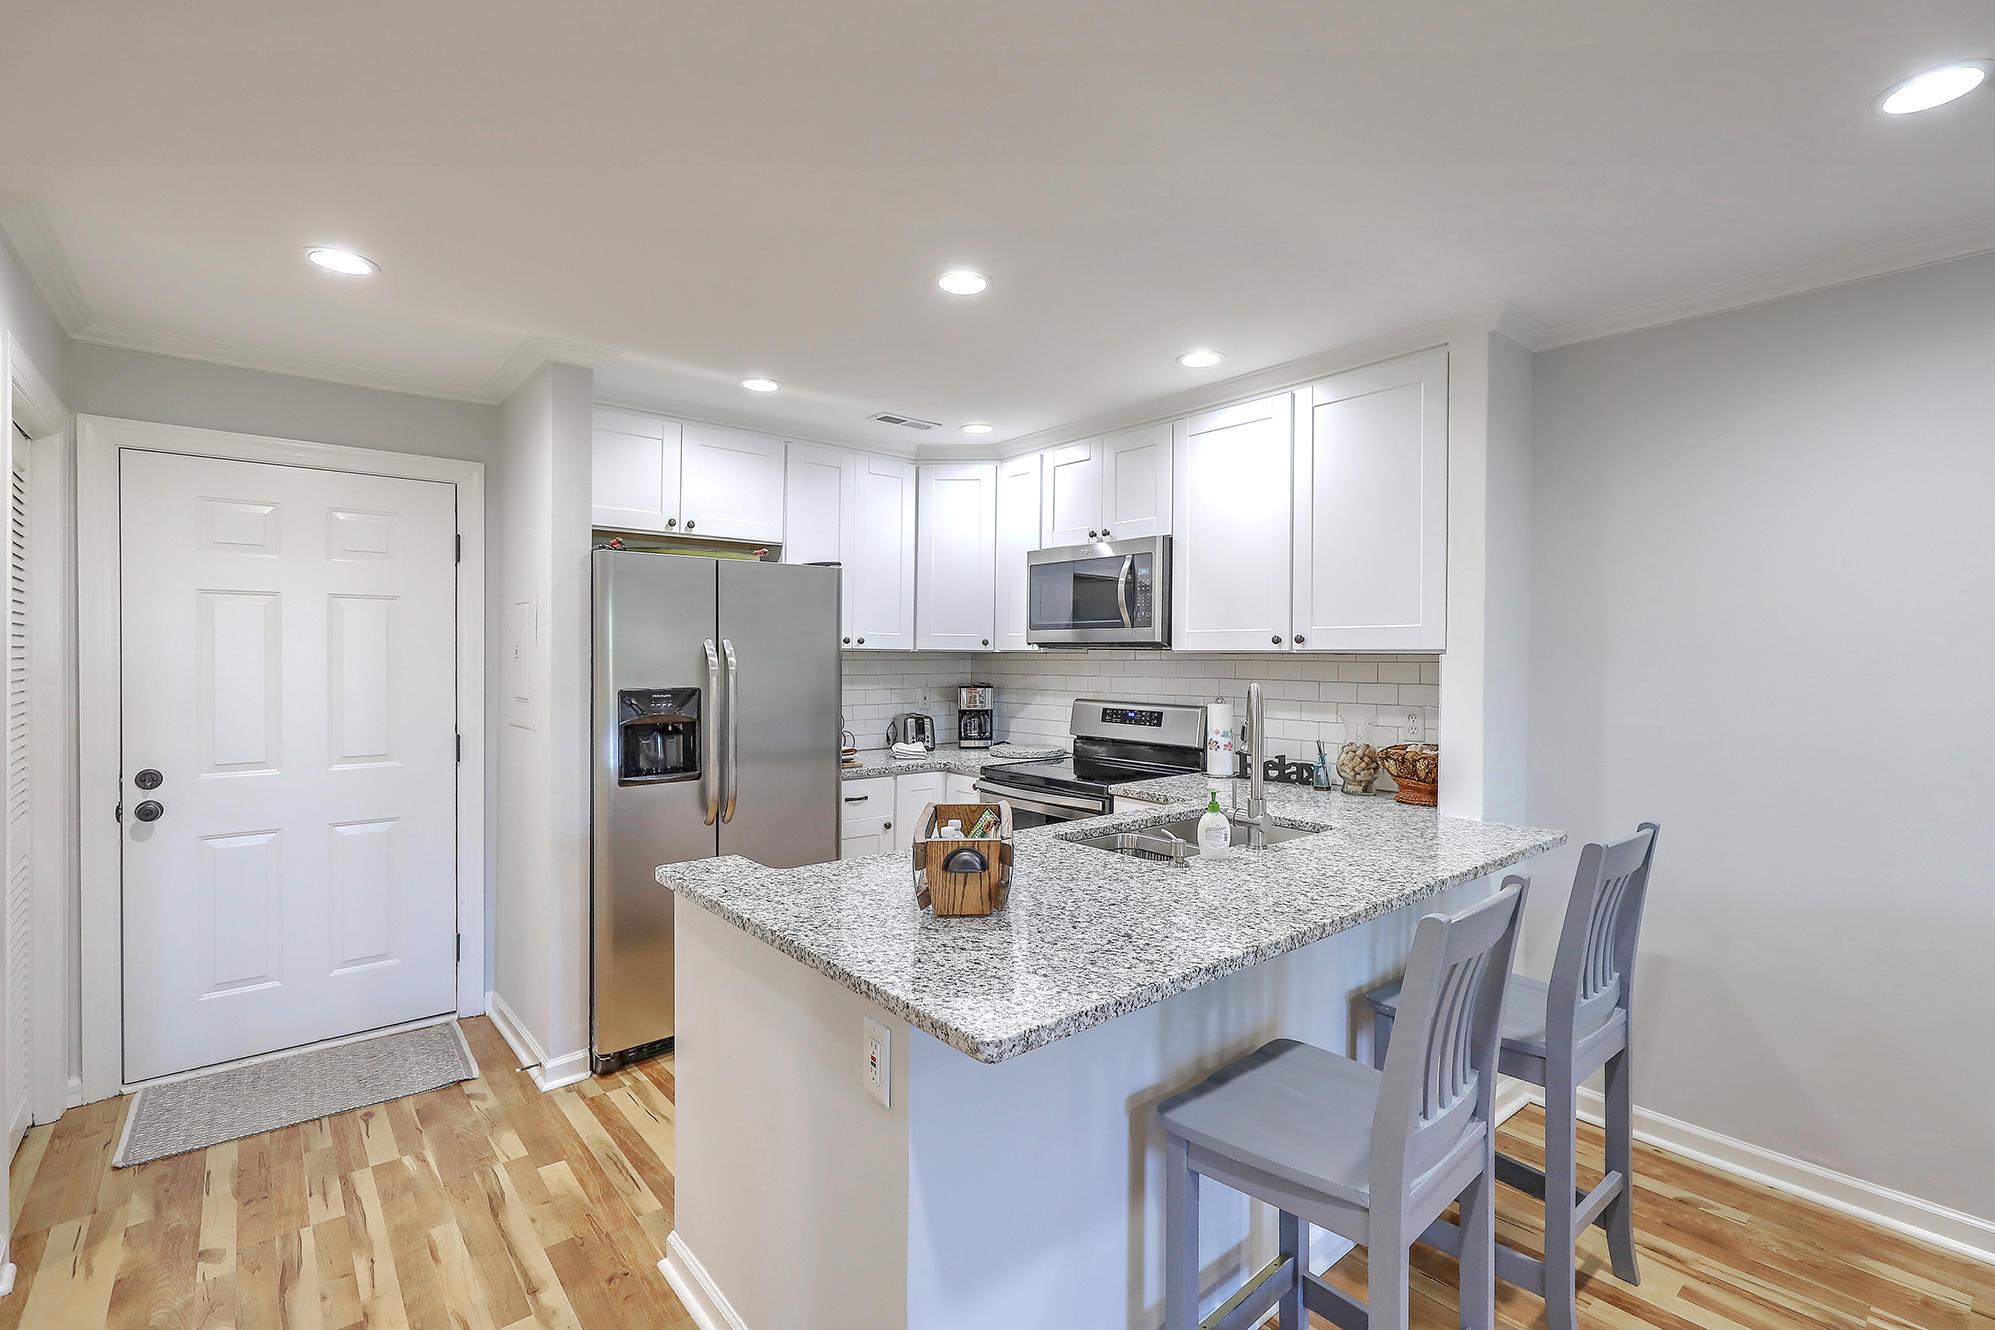 Seabrook Island Homes For Sale - 2103 Landfall, Johns Island, SC - 19